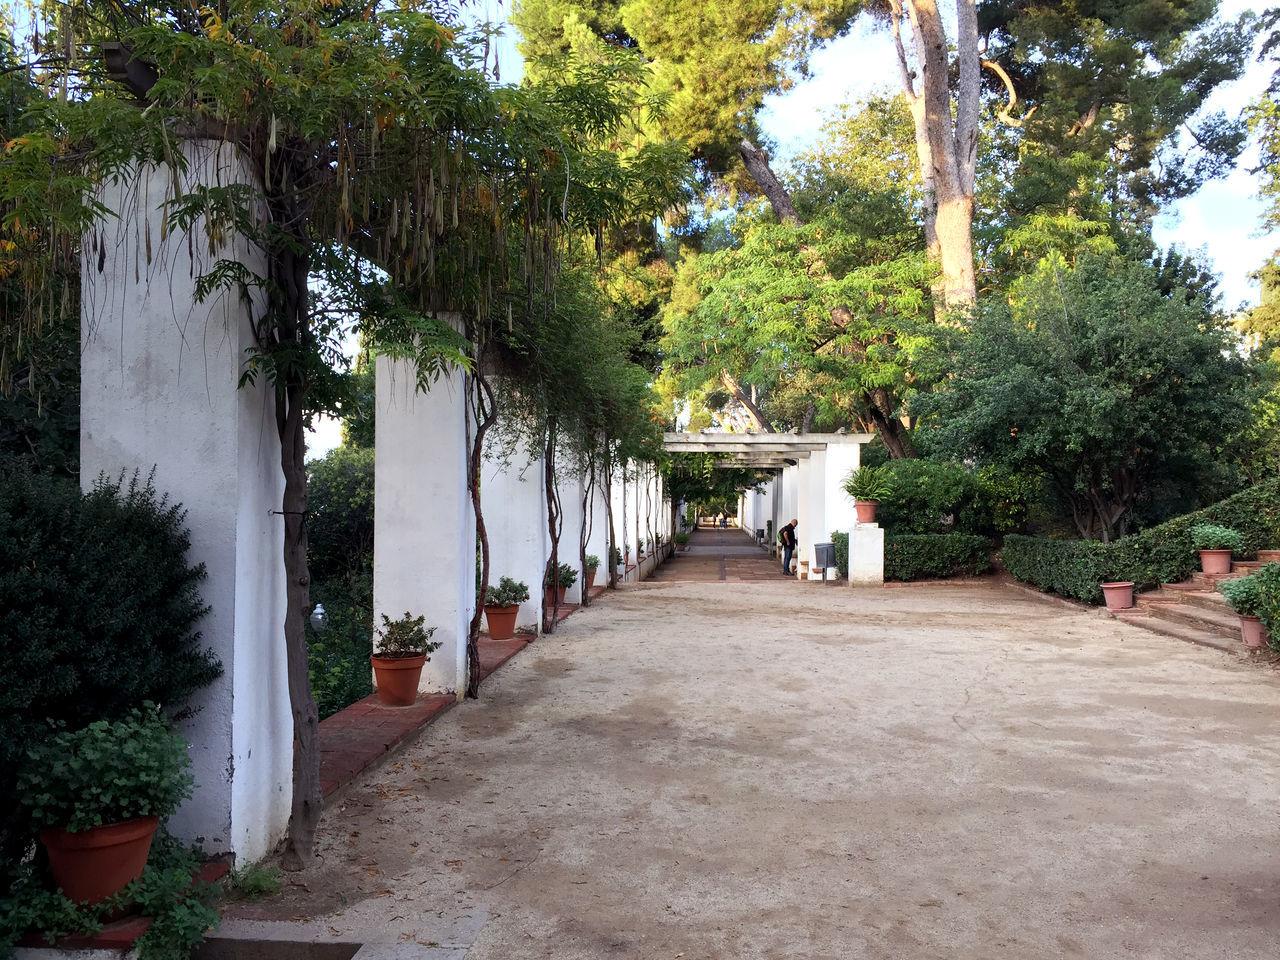 Barcelona Bcn Montjuic Nature Park Pergola Romantic SPAIN